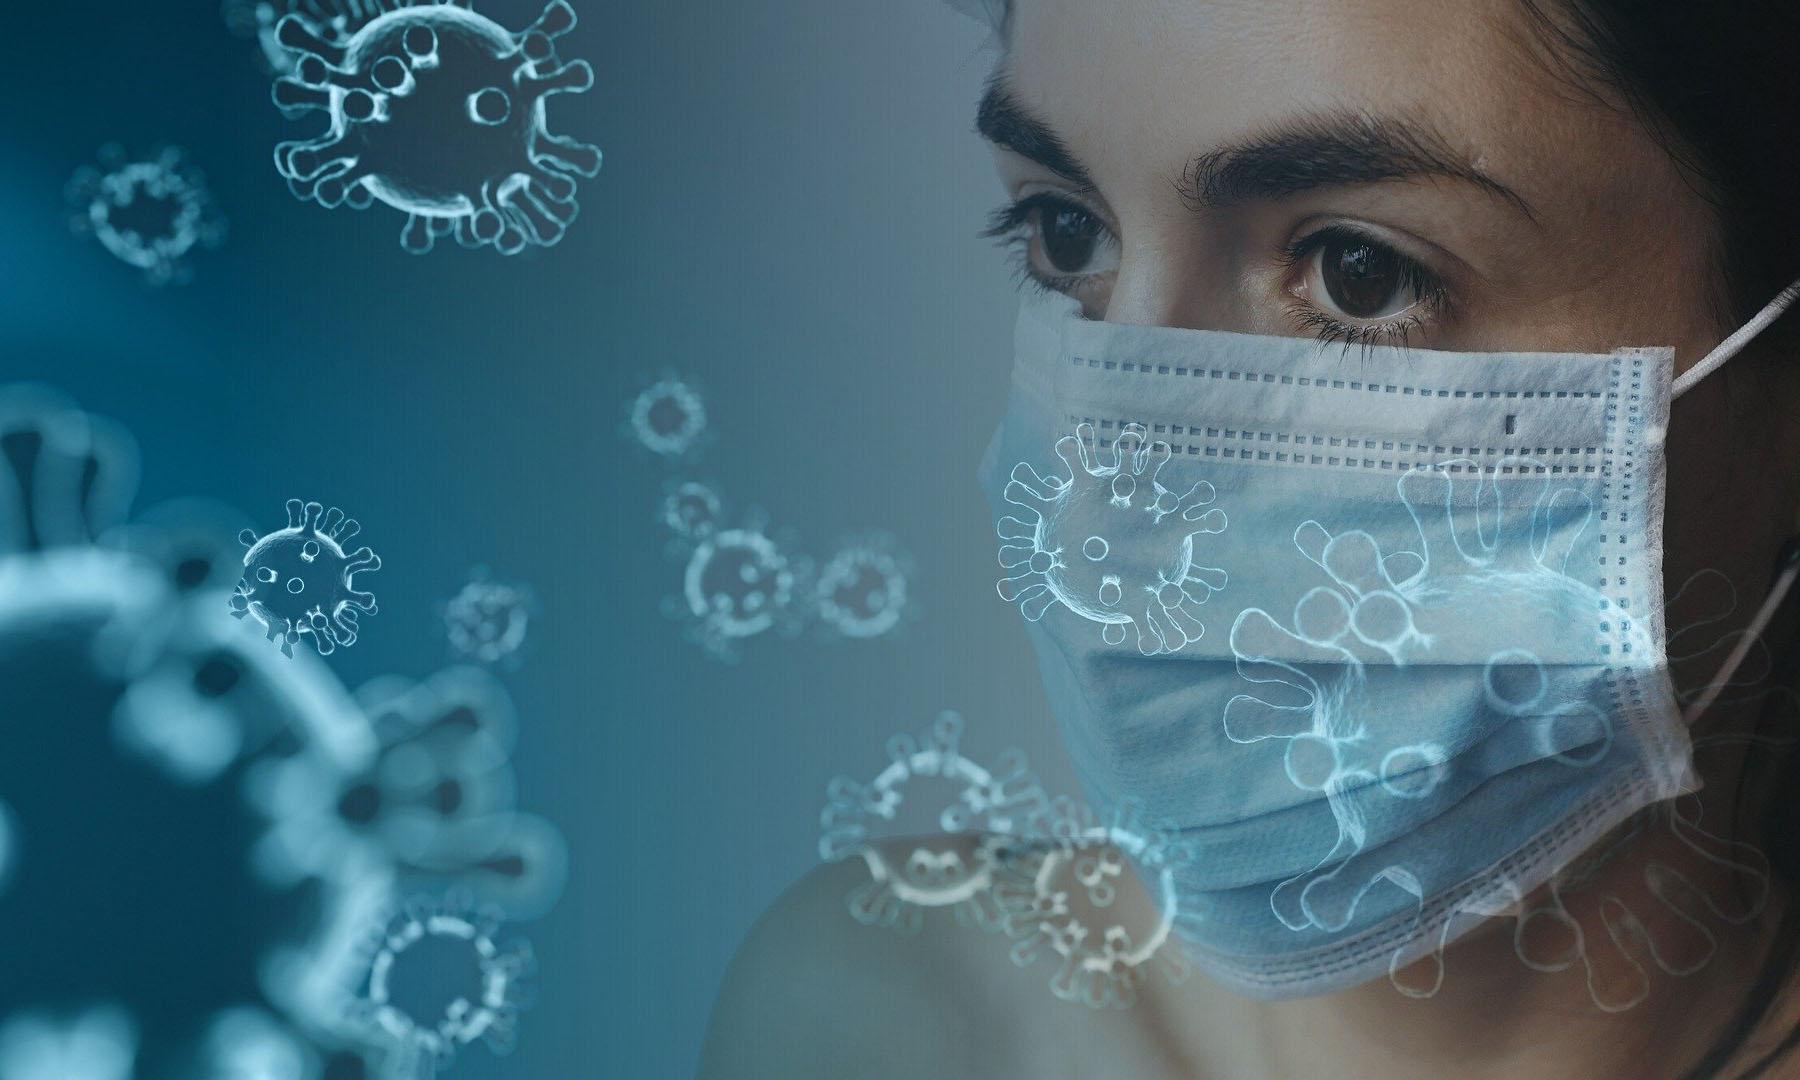 COVID-19的避难所?研究发现SARS-CoV-2攻击大脑会引起严重疾病